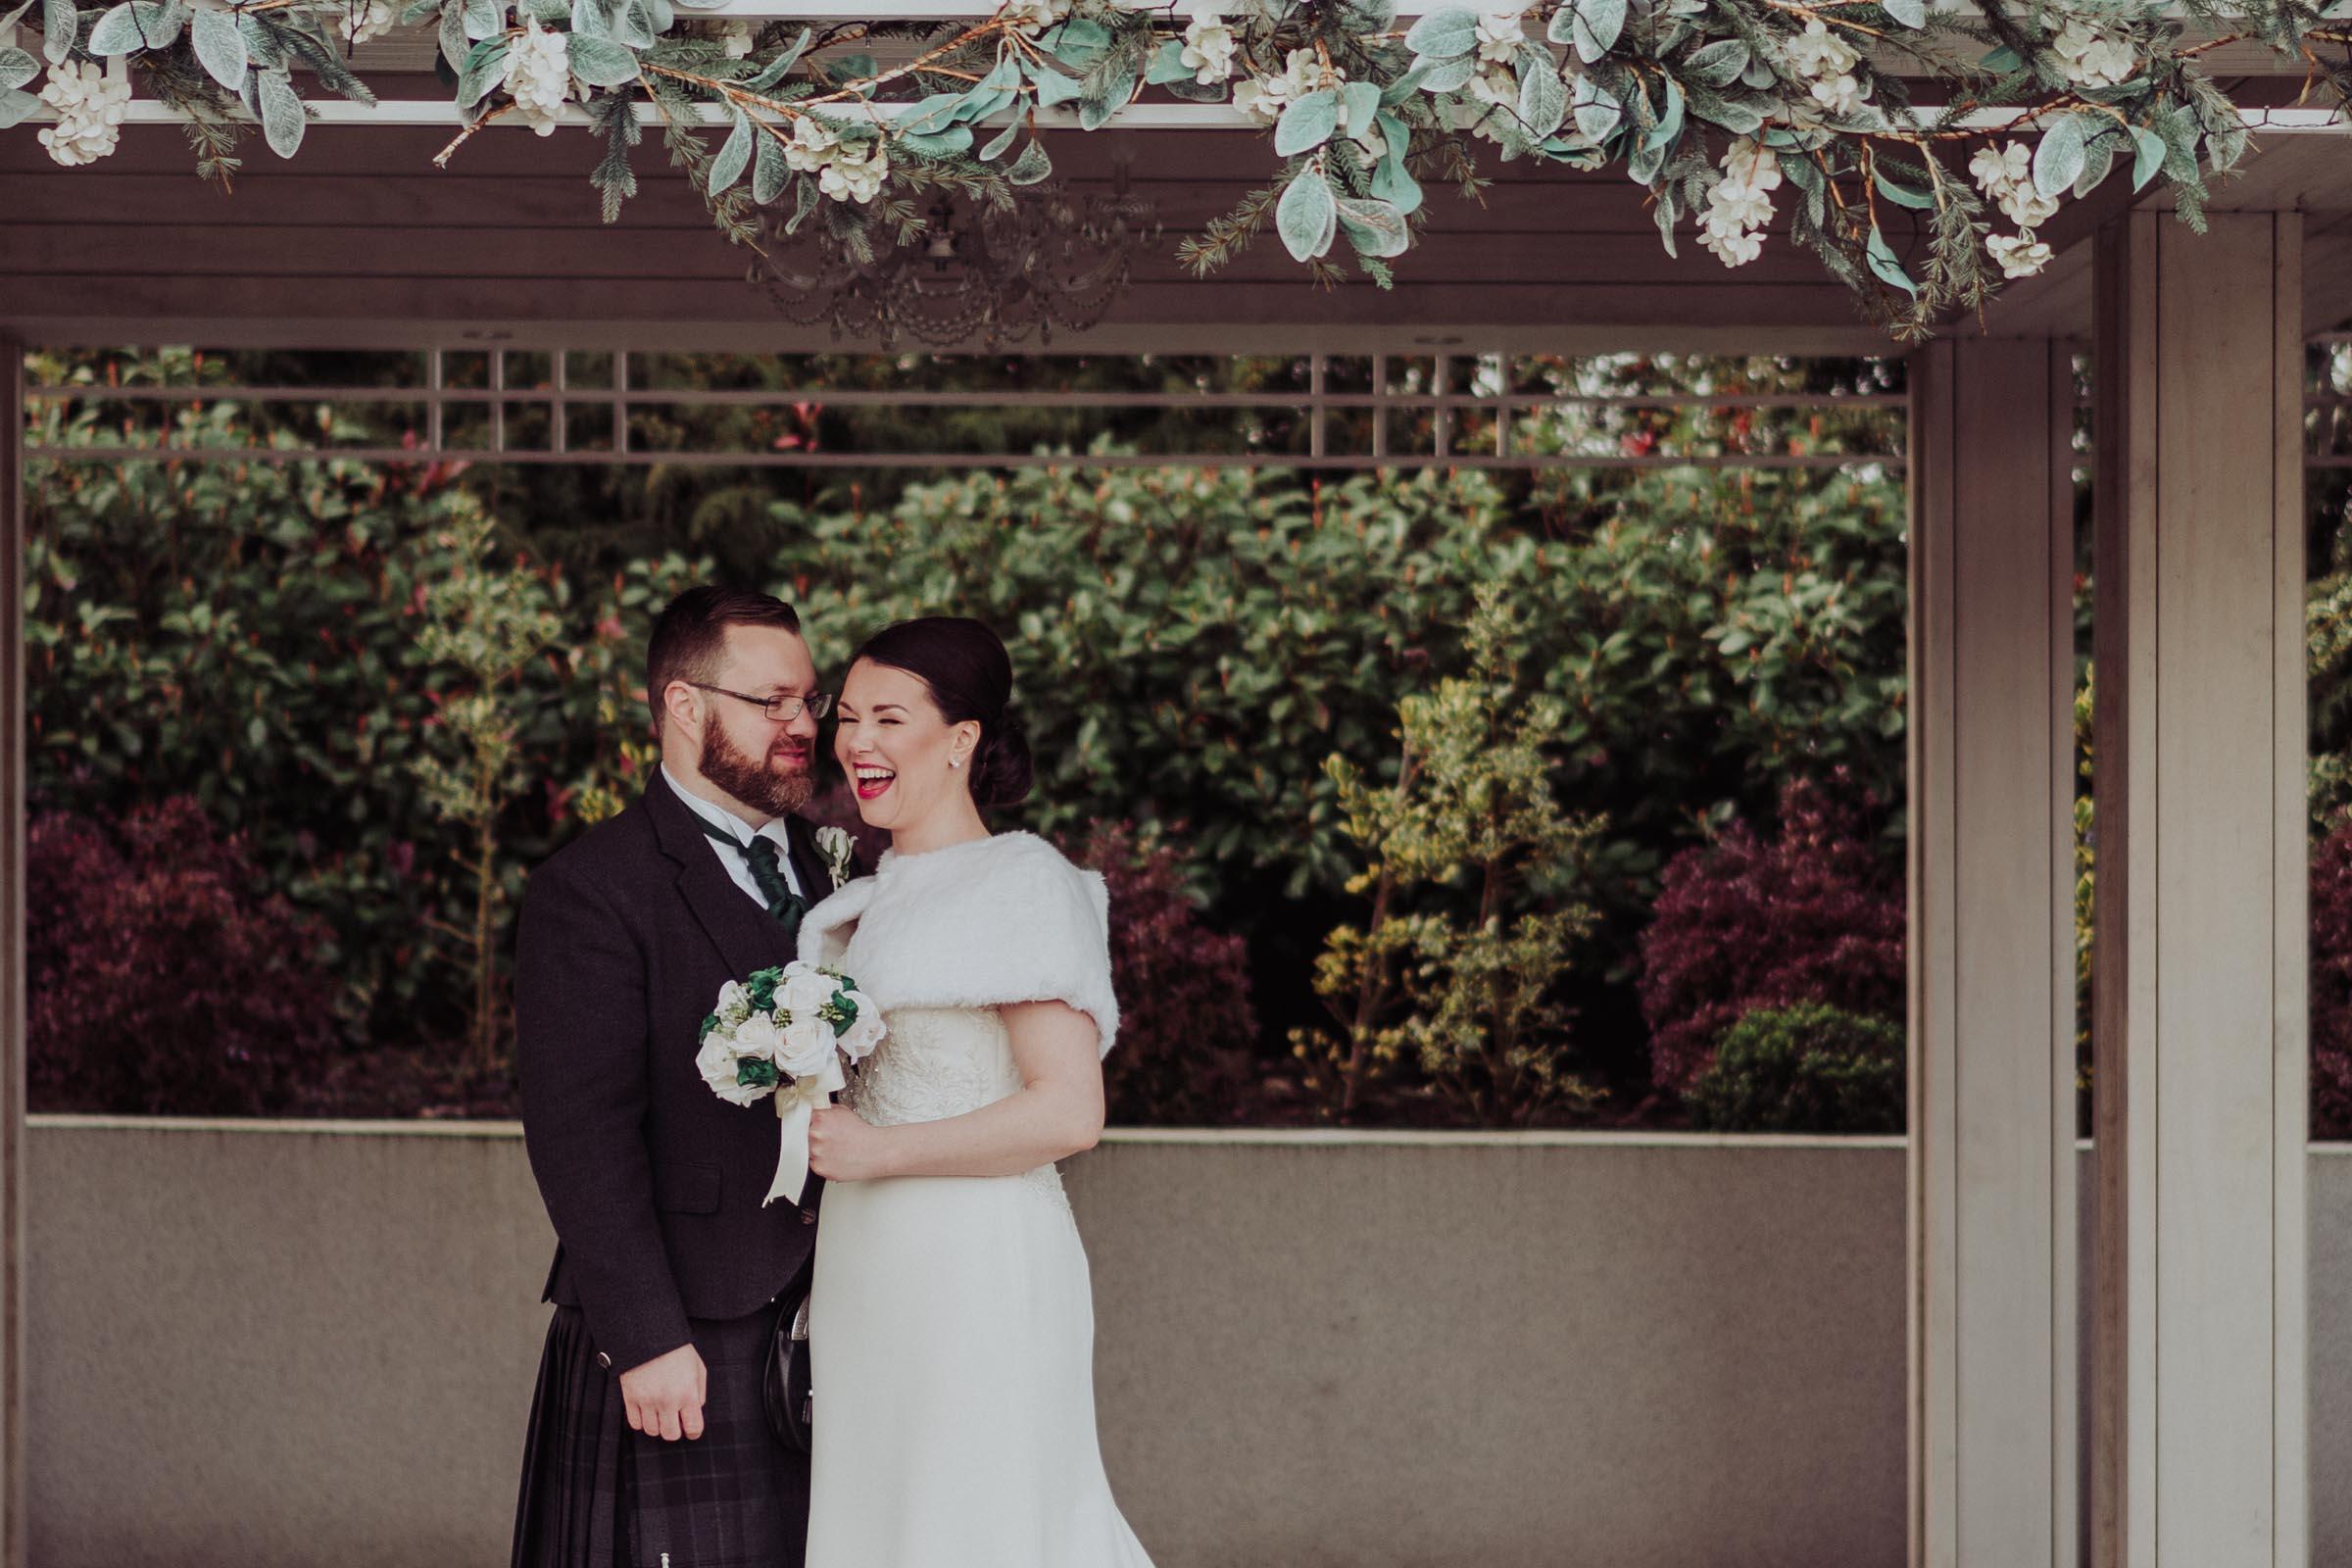 Radstone-Wedding-Dearly-Photography-Scotland (35 of 50).jpg